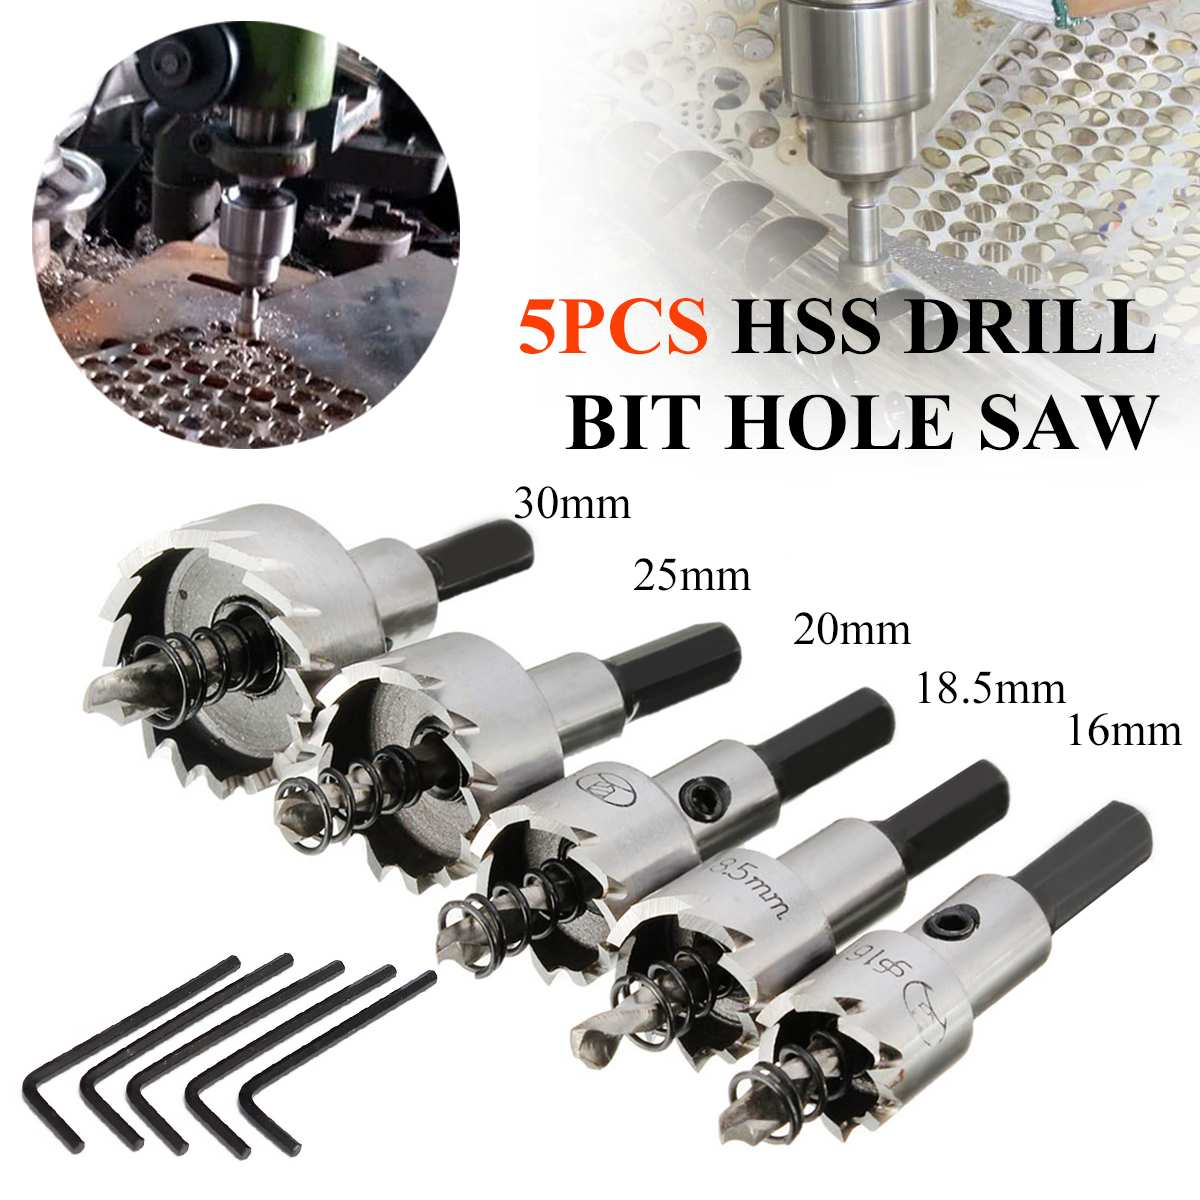 5PCS Carbide Tip HSS Drill Bit Hole Saw Set Stainless Steel Metal Alloy 16/18.5/20/25/30mm